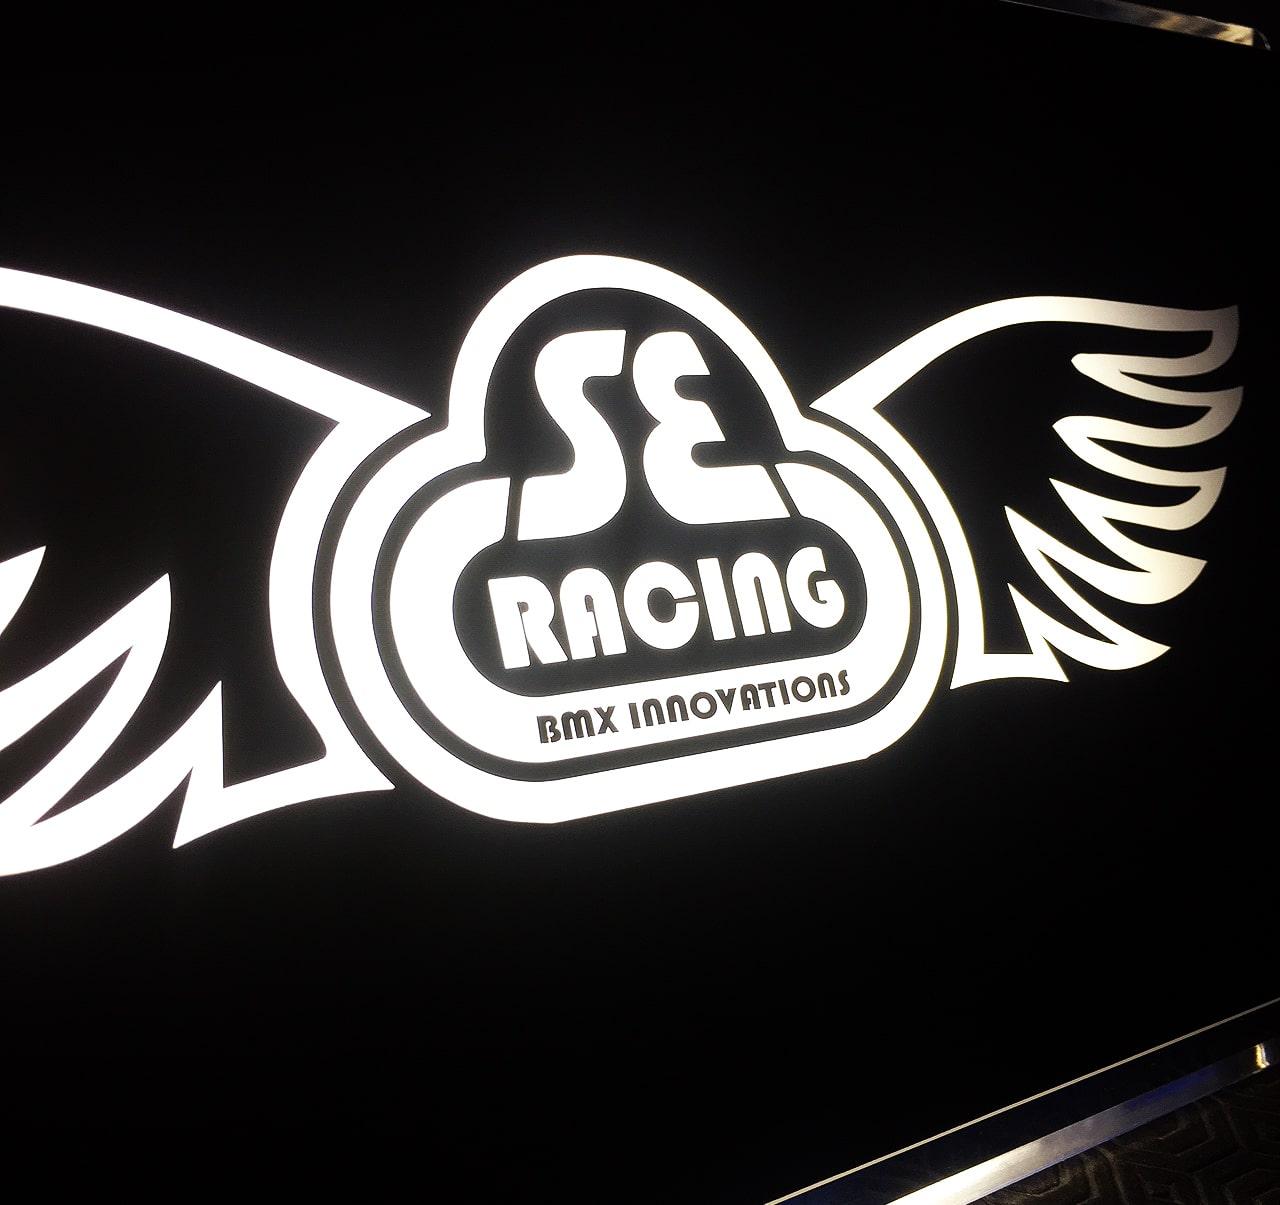 SE Racing Illuminated Beer Pump